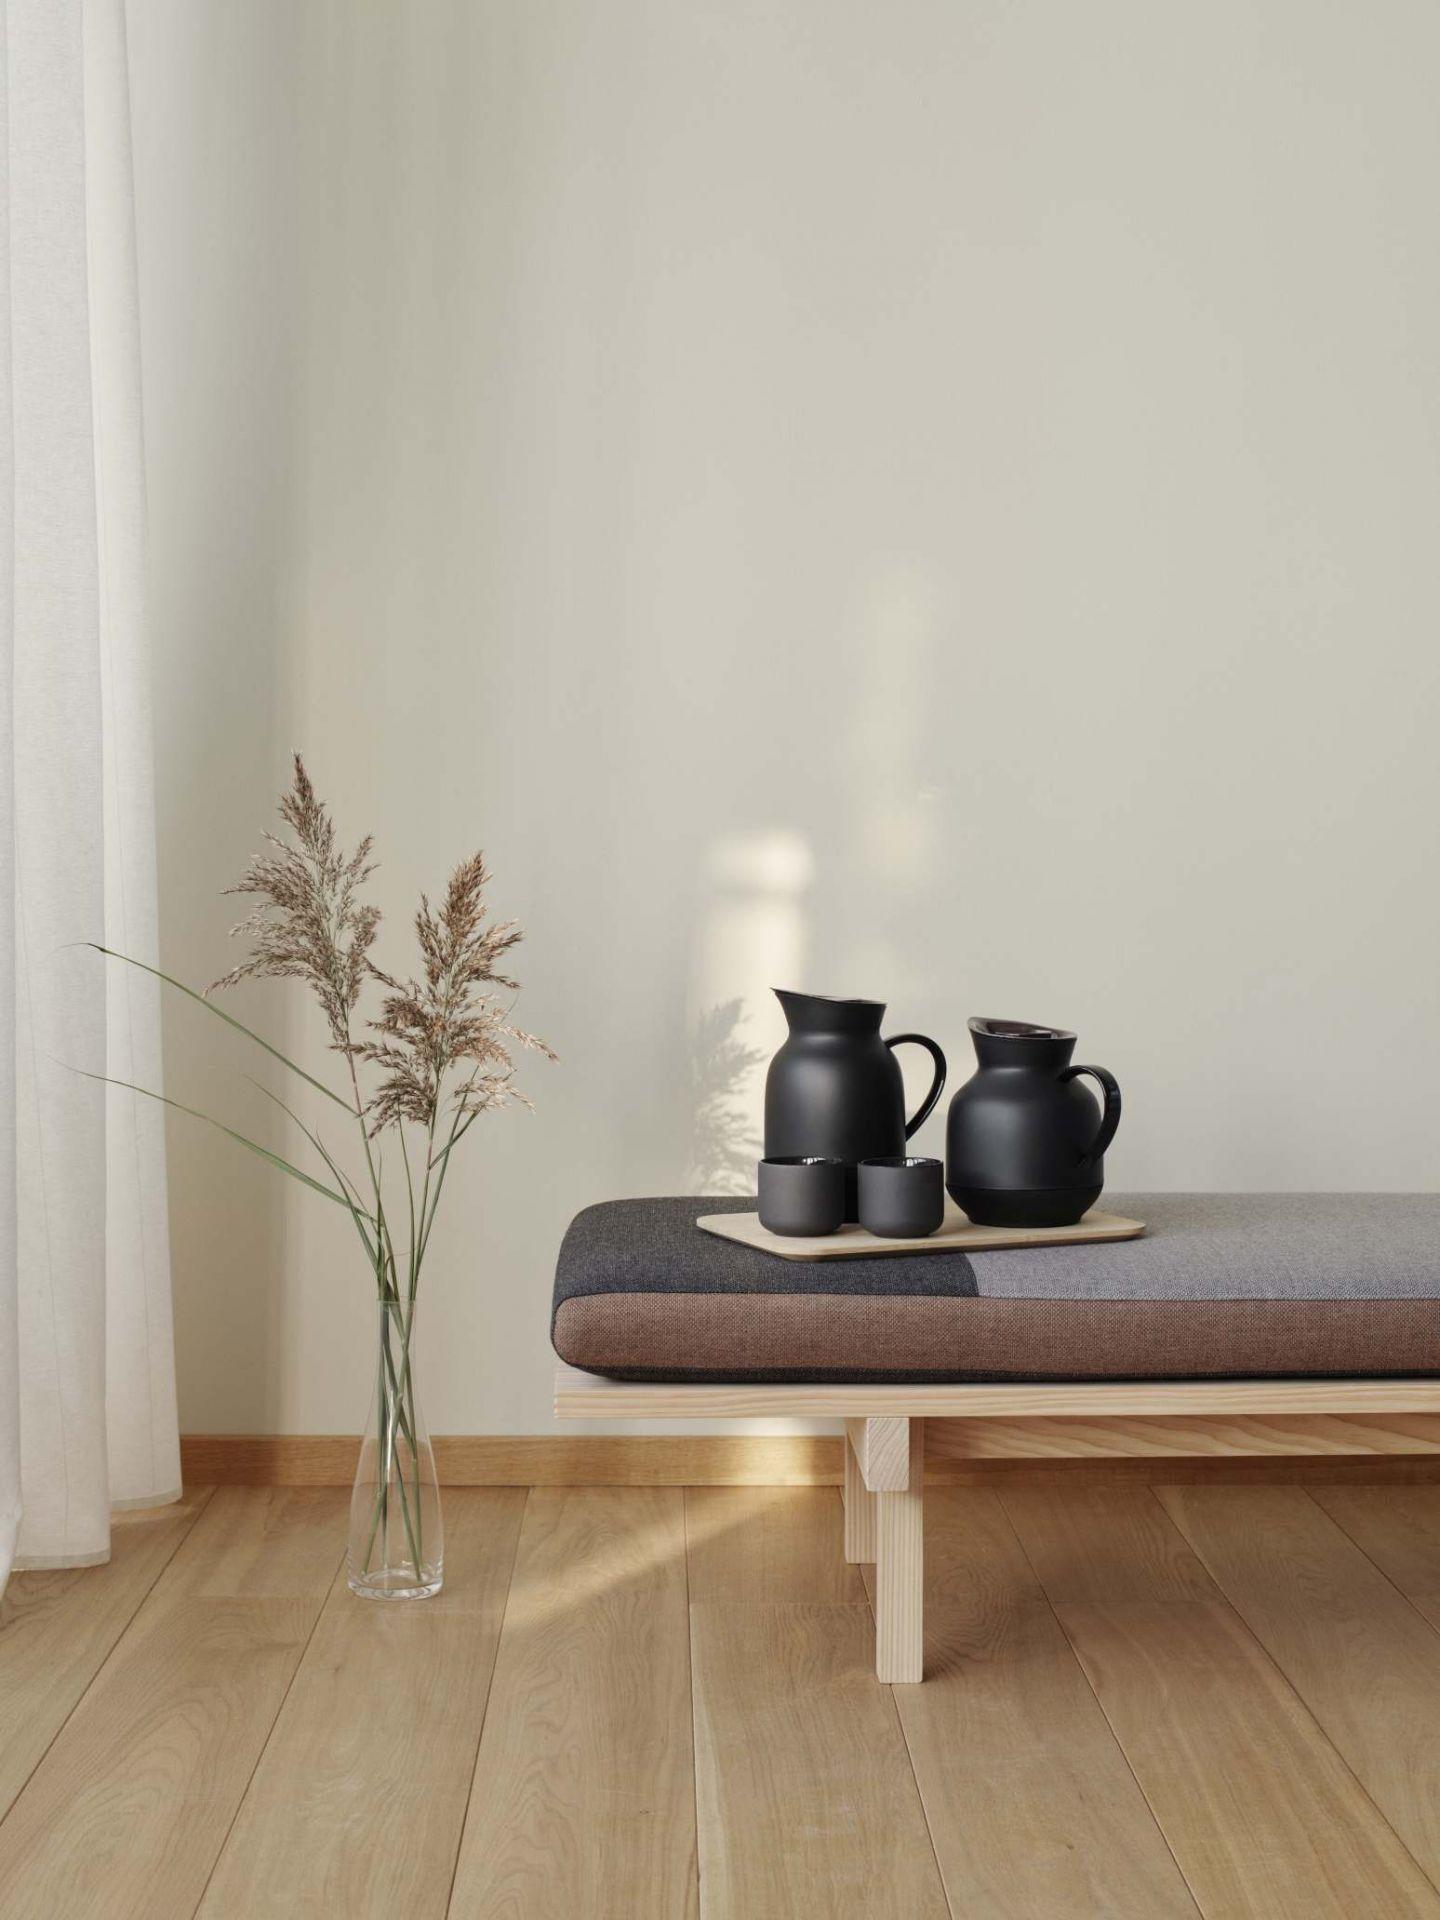 Amphora Coffee pot / Vacuum jug Stelton